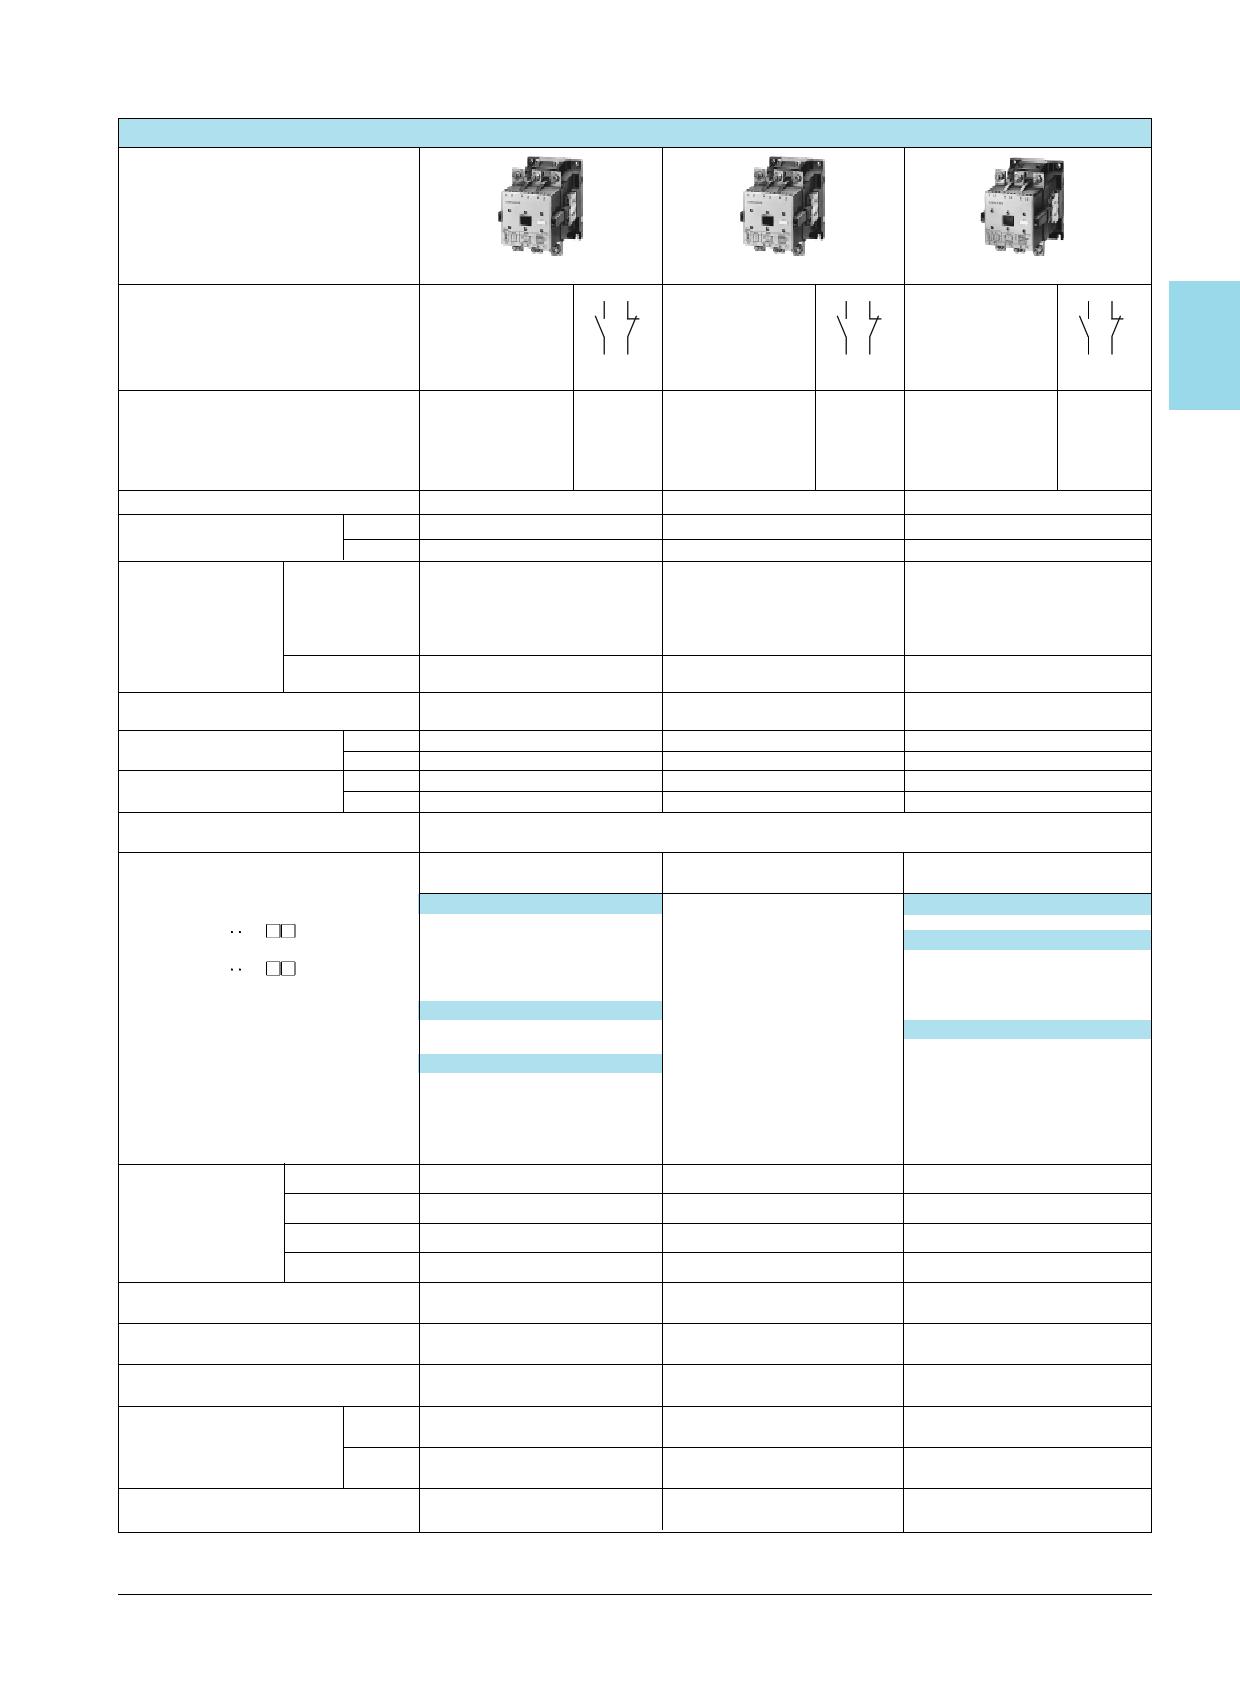 3TF48 Datasheet, Funktion